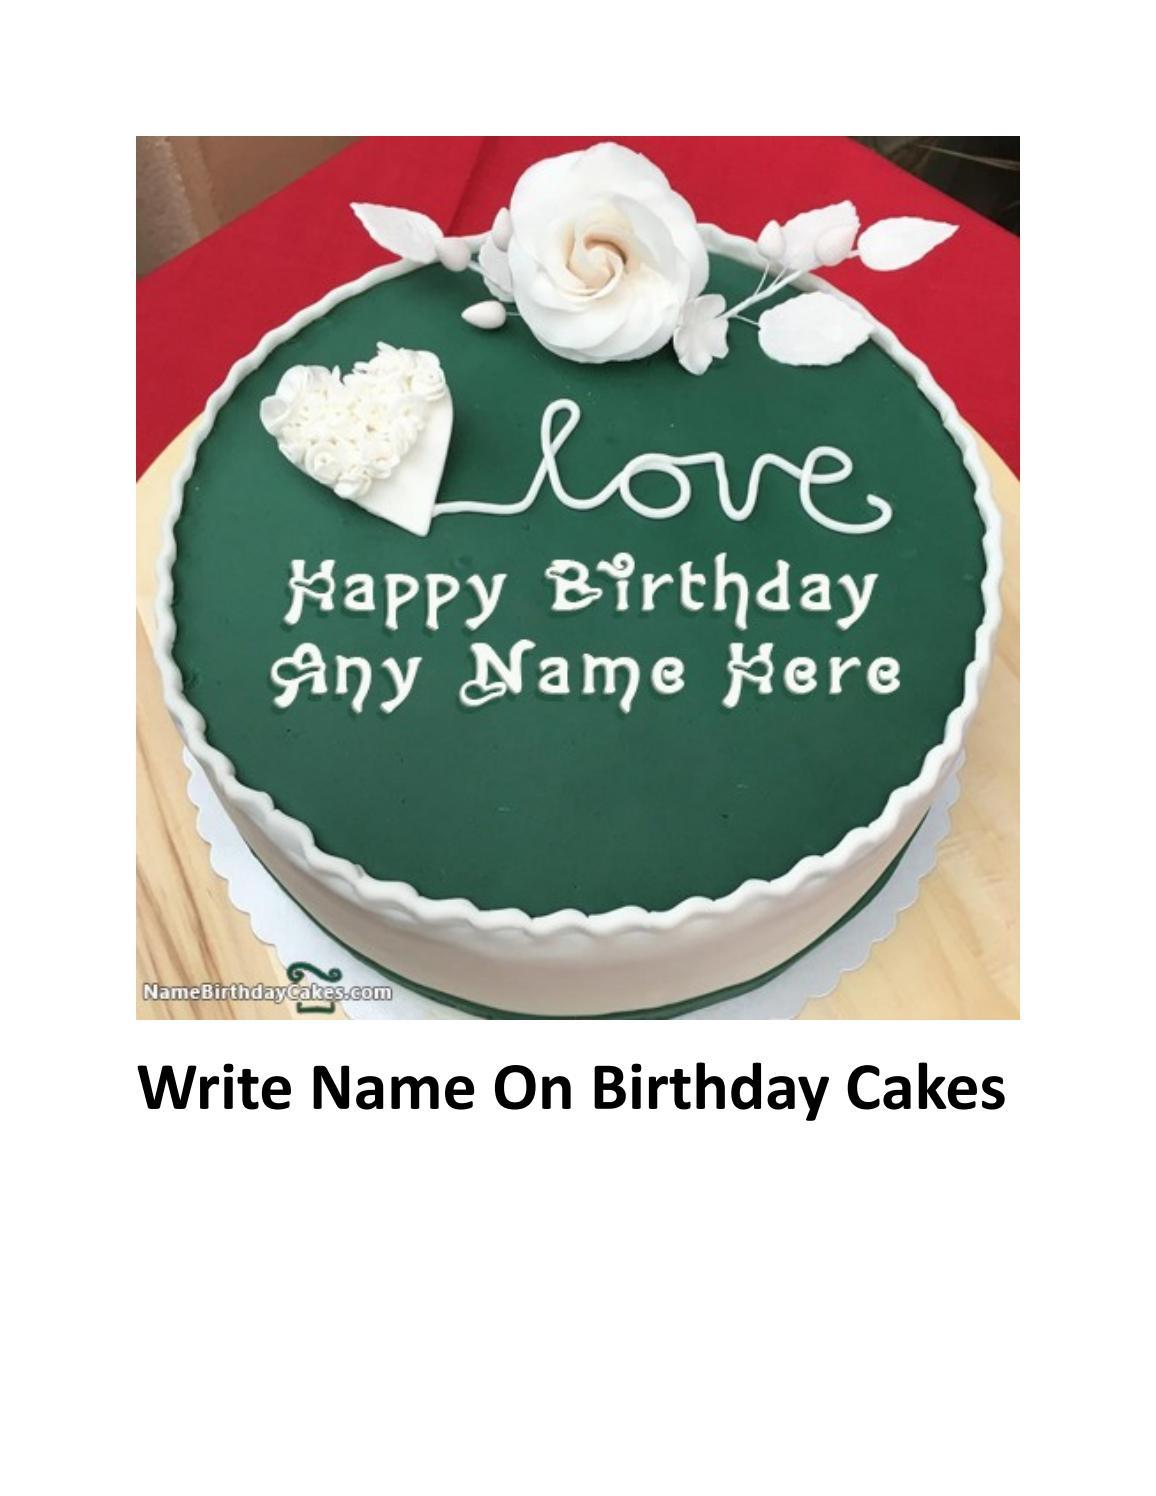 Write Name On Birthday Cakes By Name Birthday Cakes Issuu